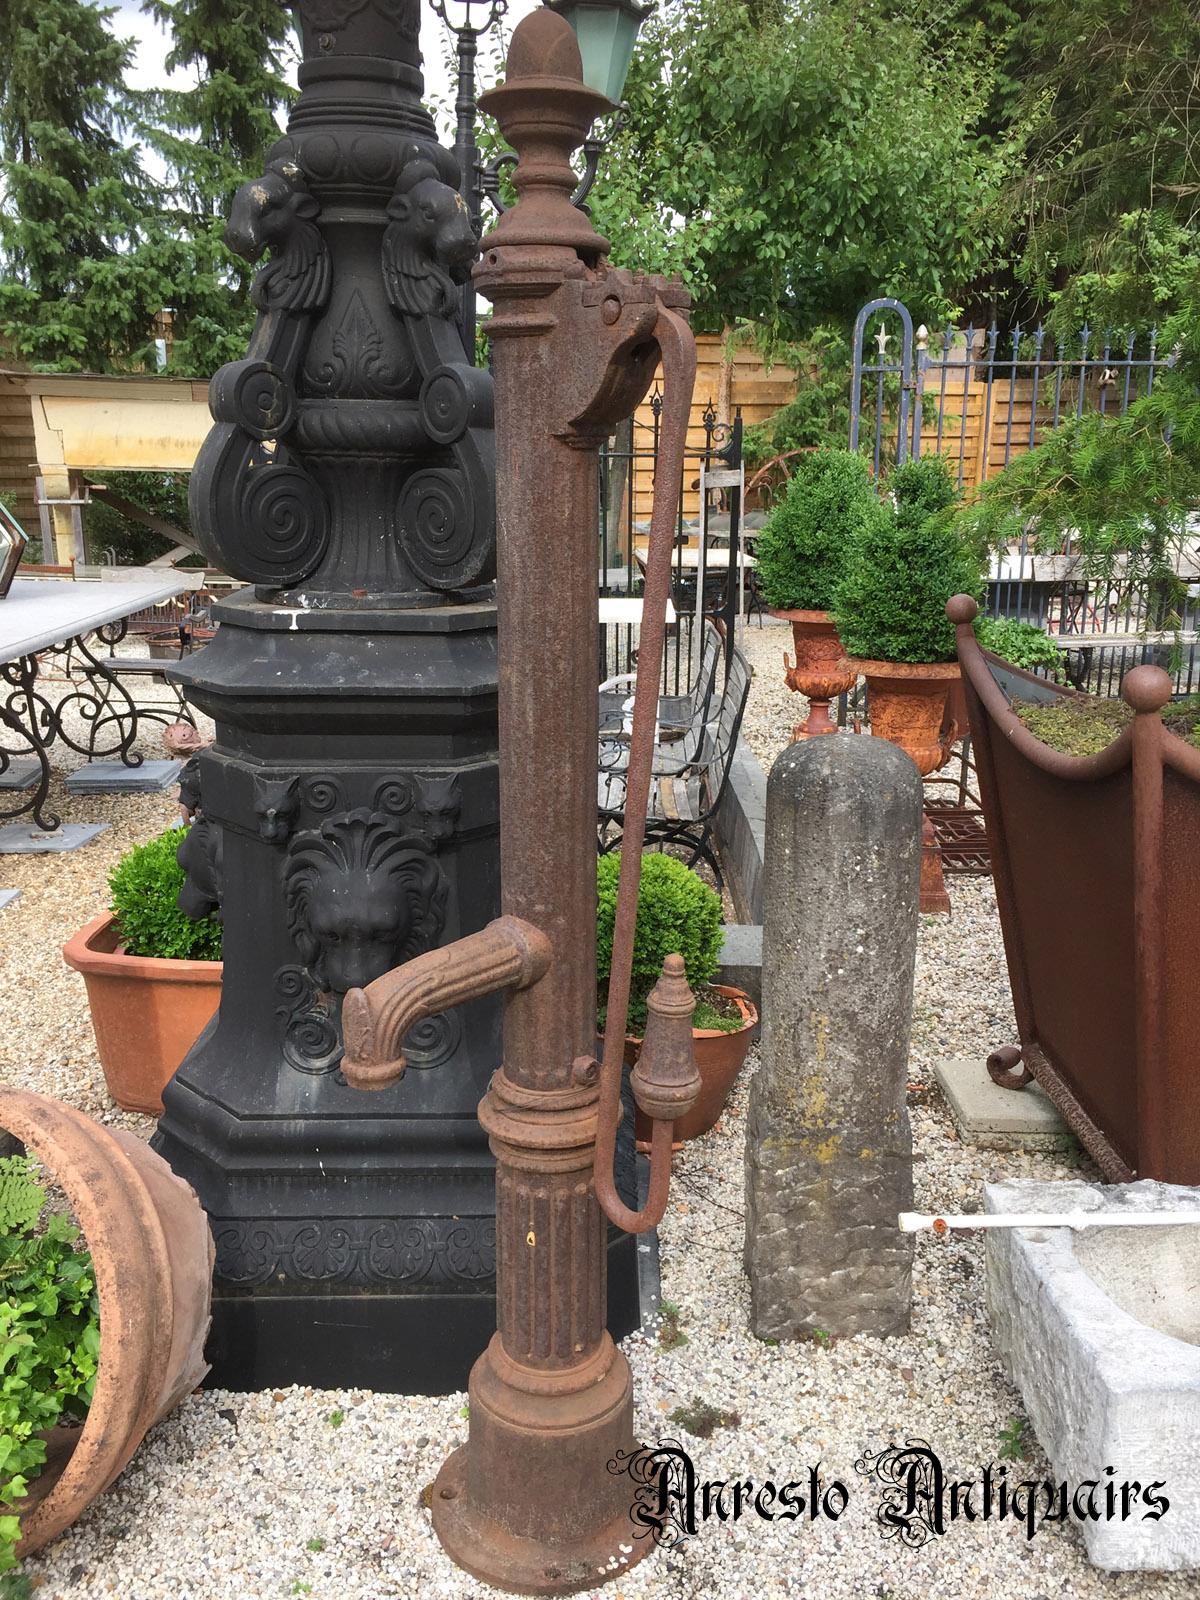 Ref. 83 – Antieke Ardeense gietijzeren stadspomp, oude ijzeren waterpomp foto 1